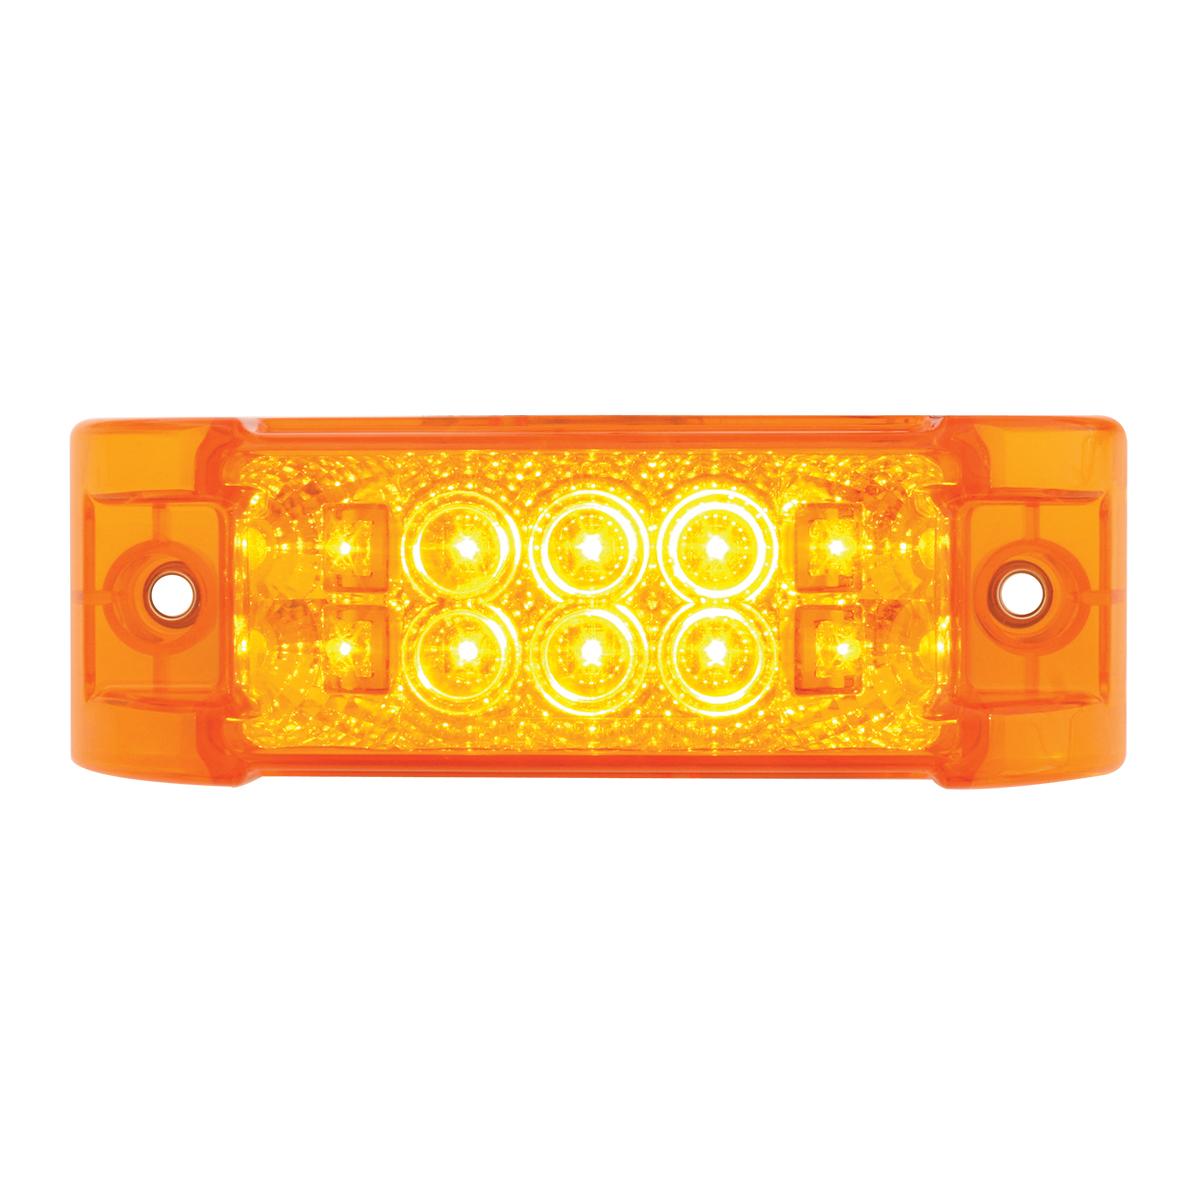 76210 Rectangular Wide Angle Spyder LED Marker Light in Amber/Amber